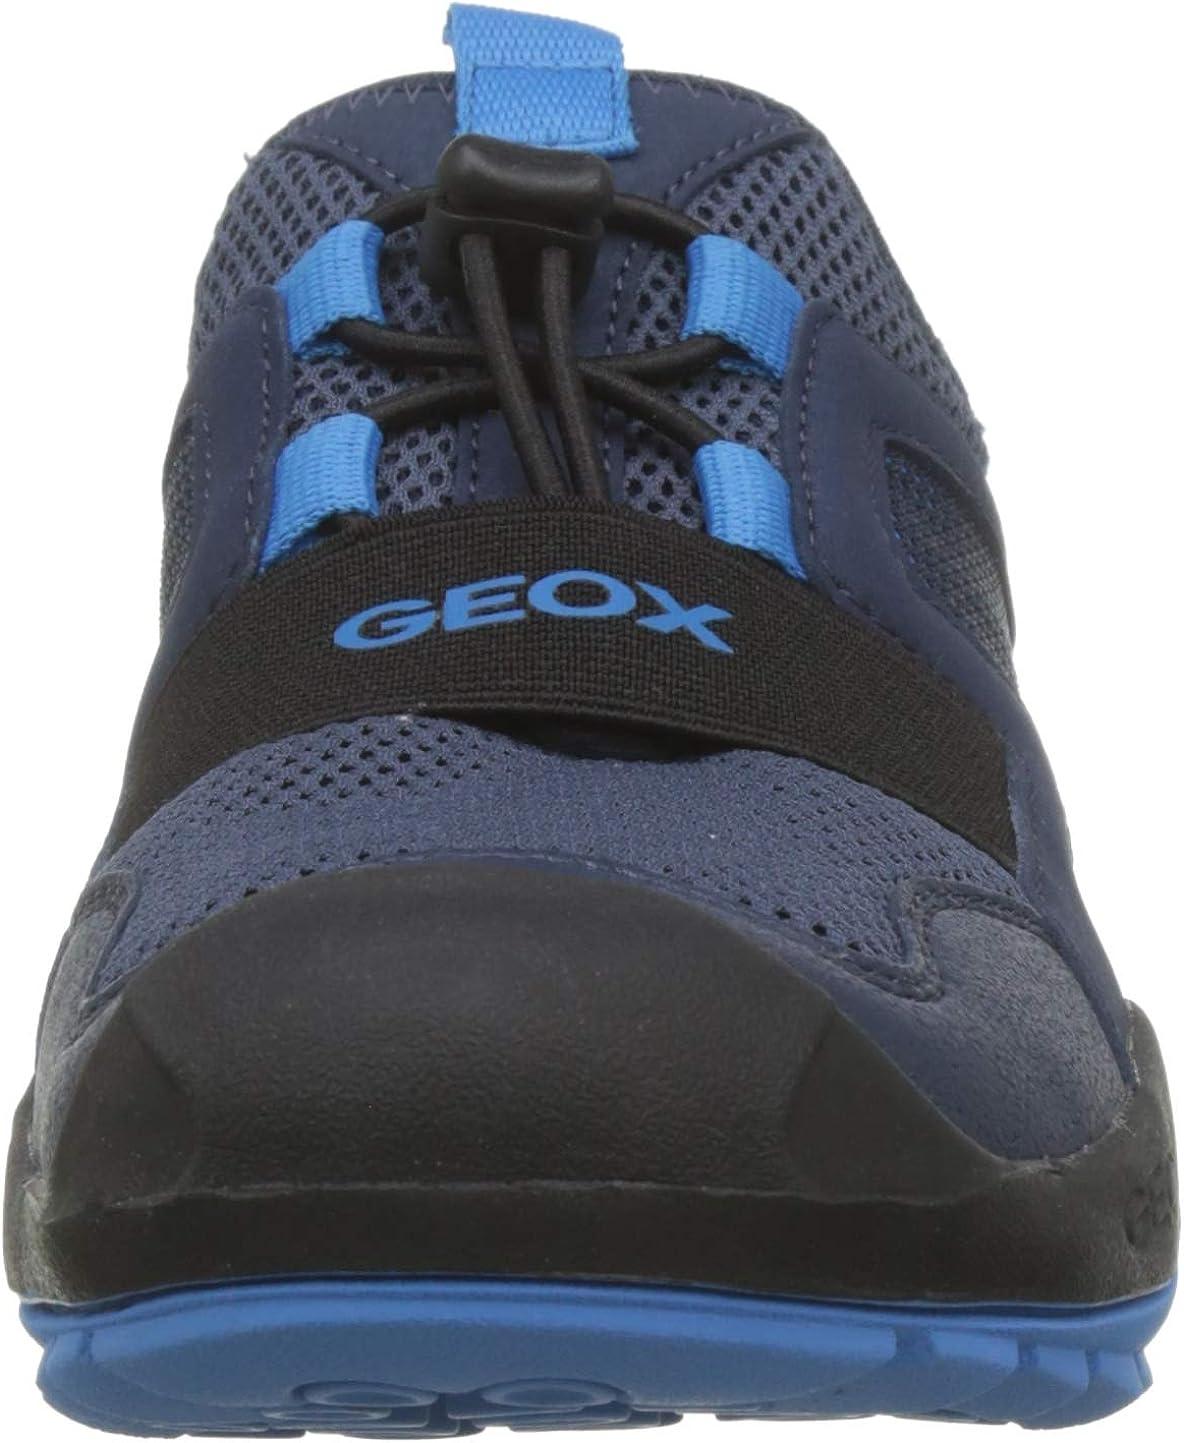 Geox Kids New Savage Boy 12 Play Slip on Closed Toe Sandal Sneaker